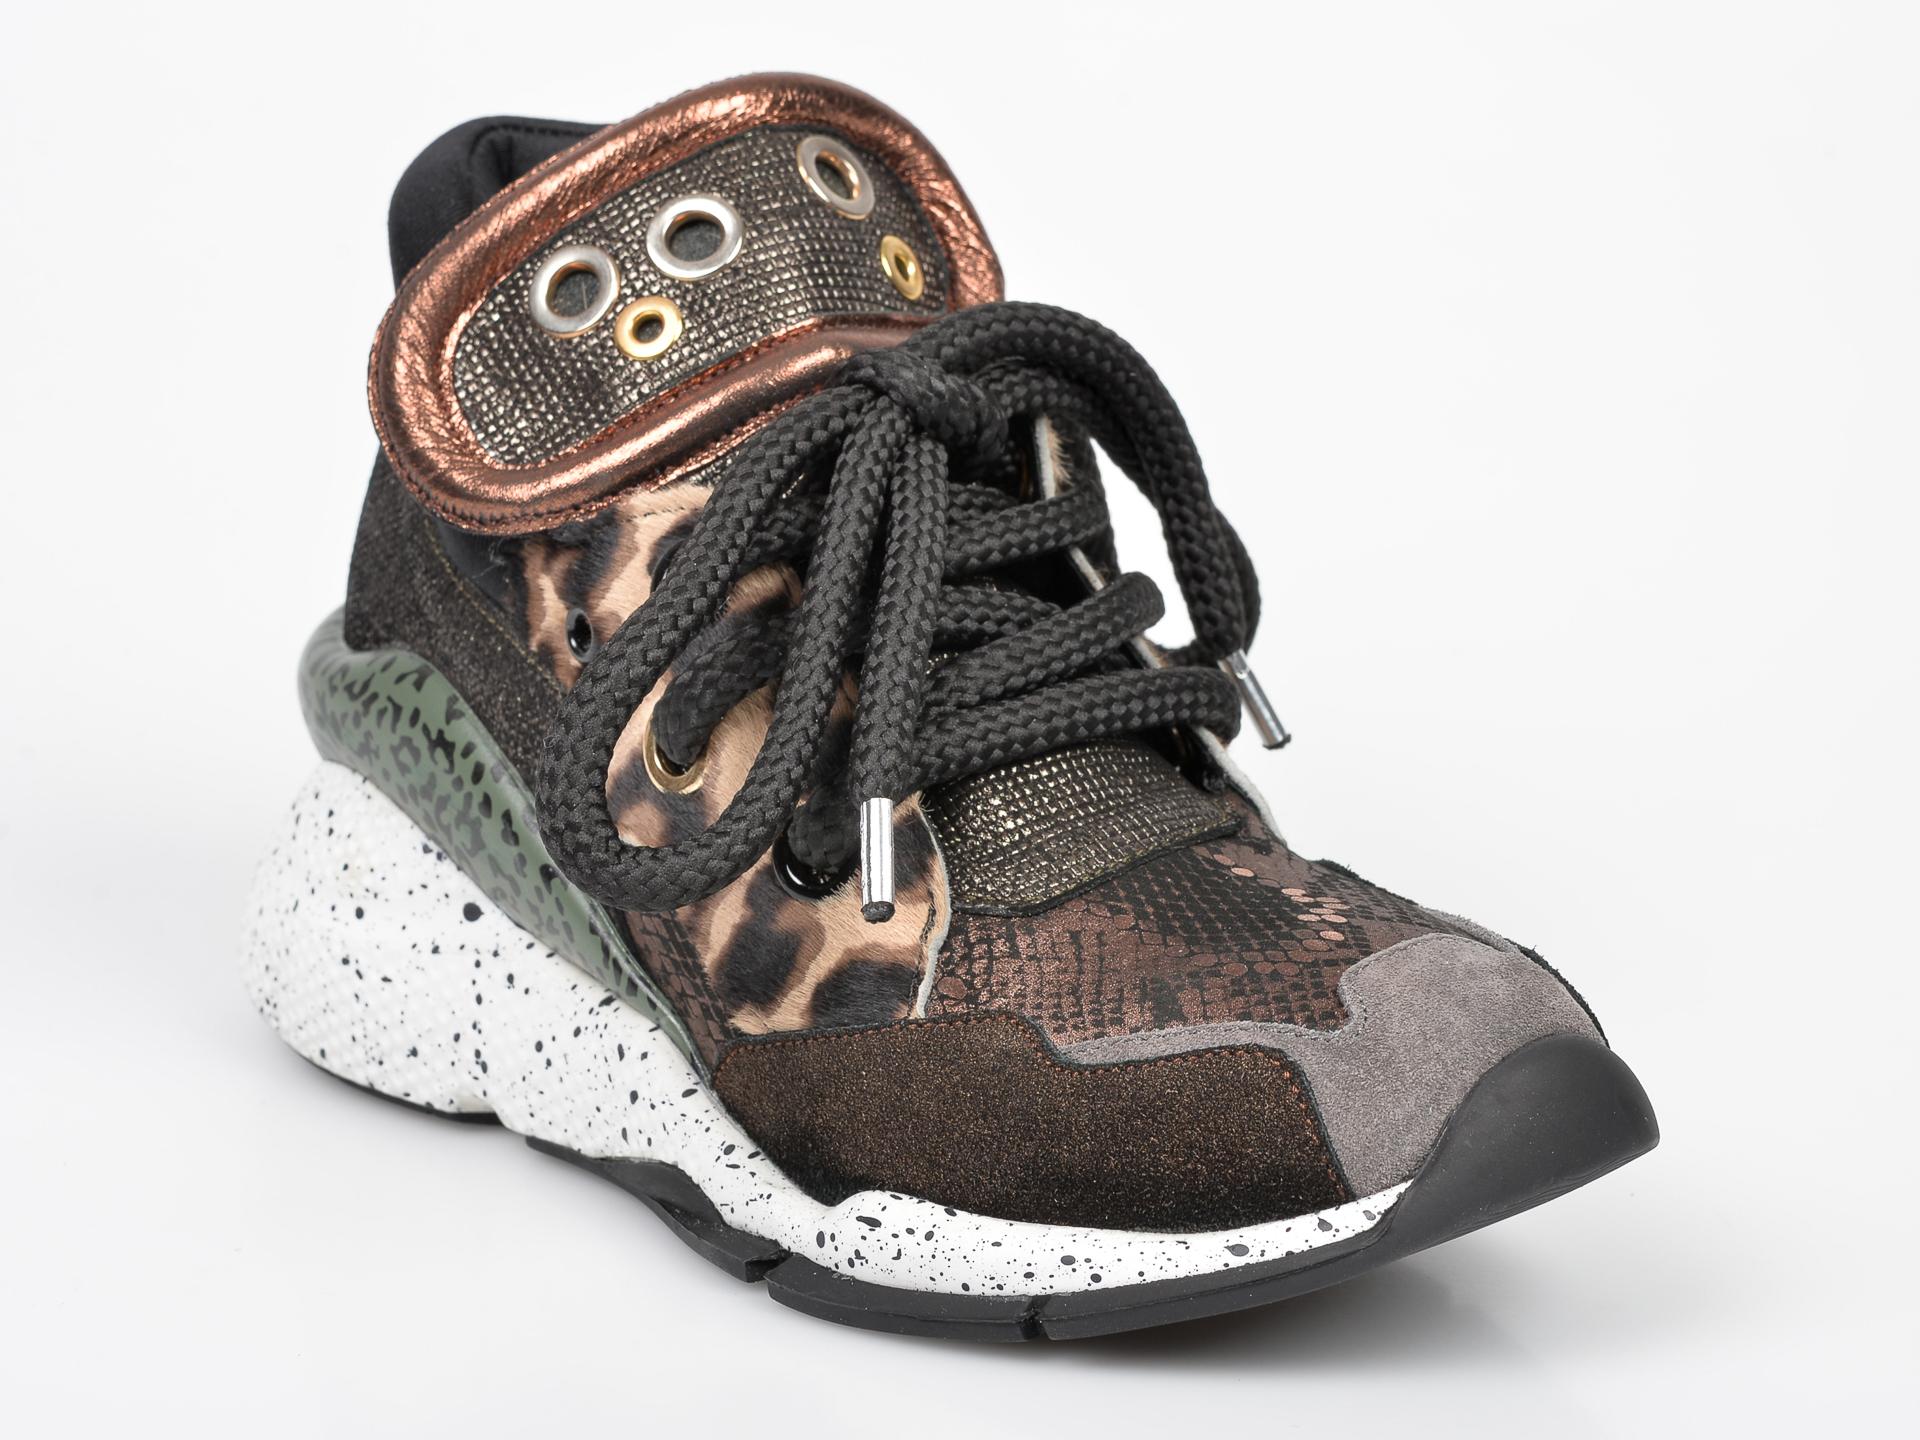 Pantofi Sport Flavia Passini Maro, 3002, Din Material Textil Si Piele Intoarsa